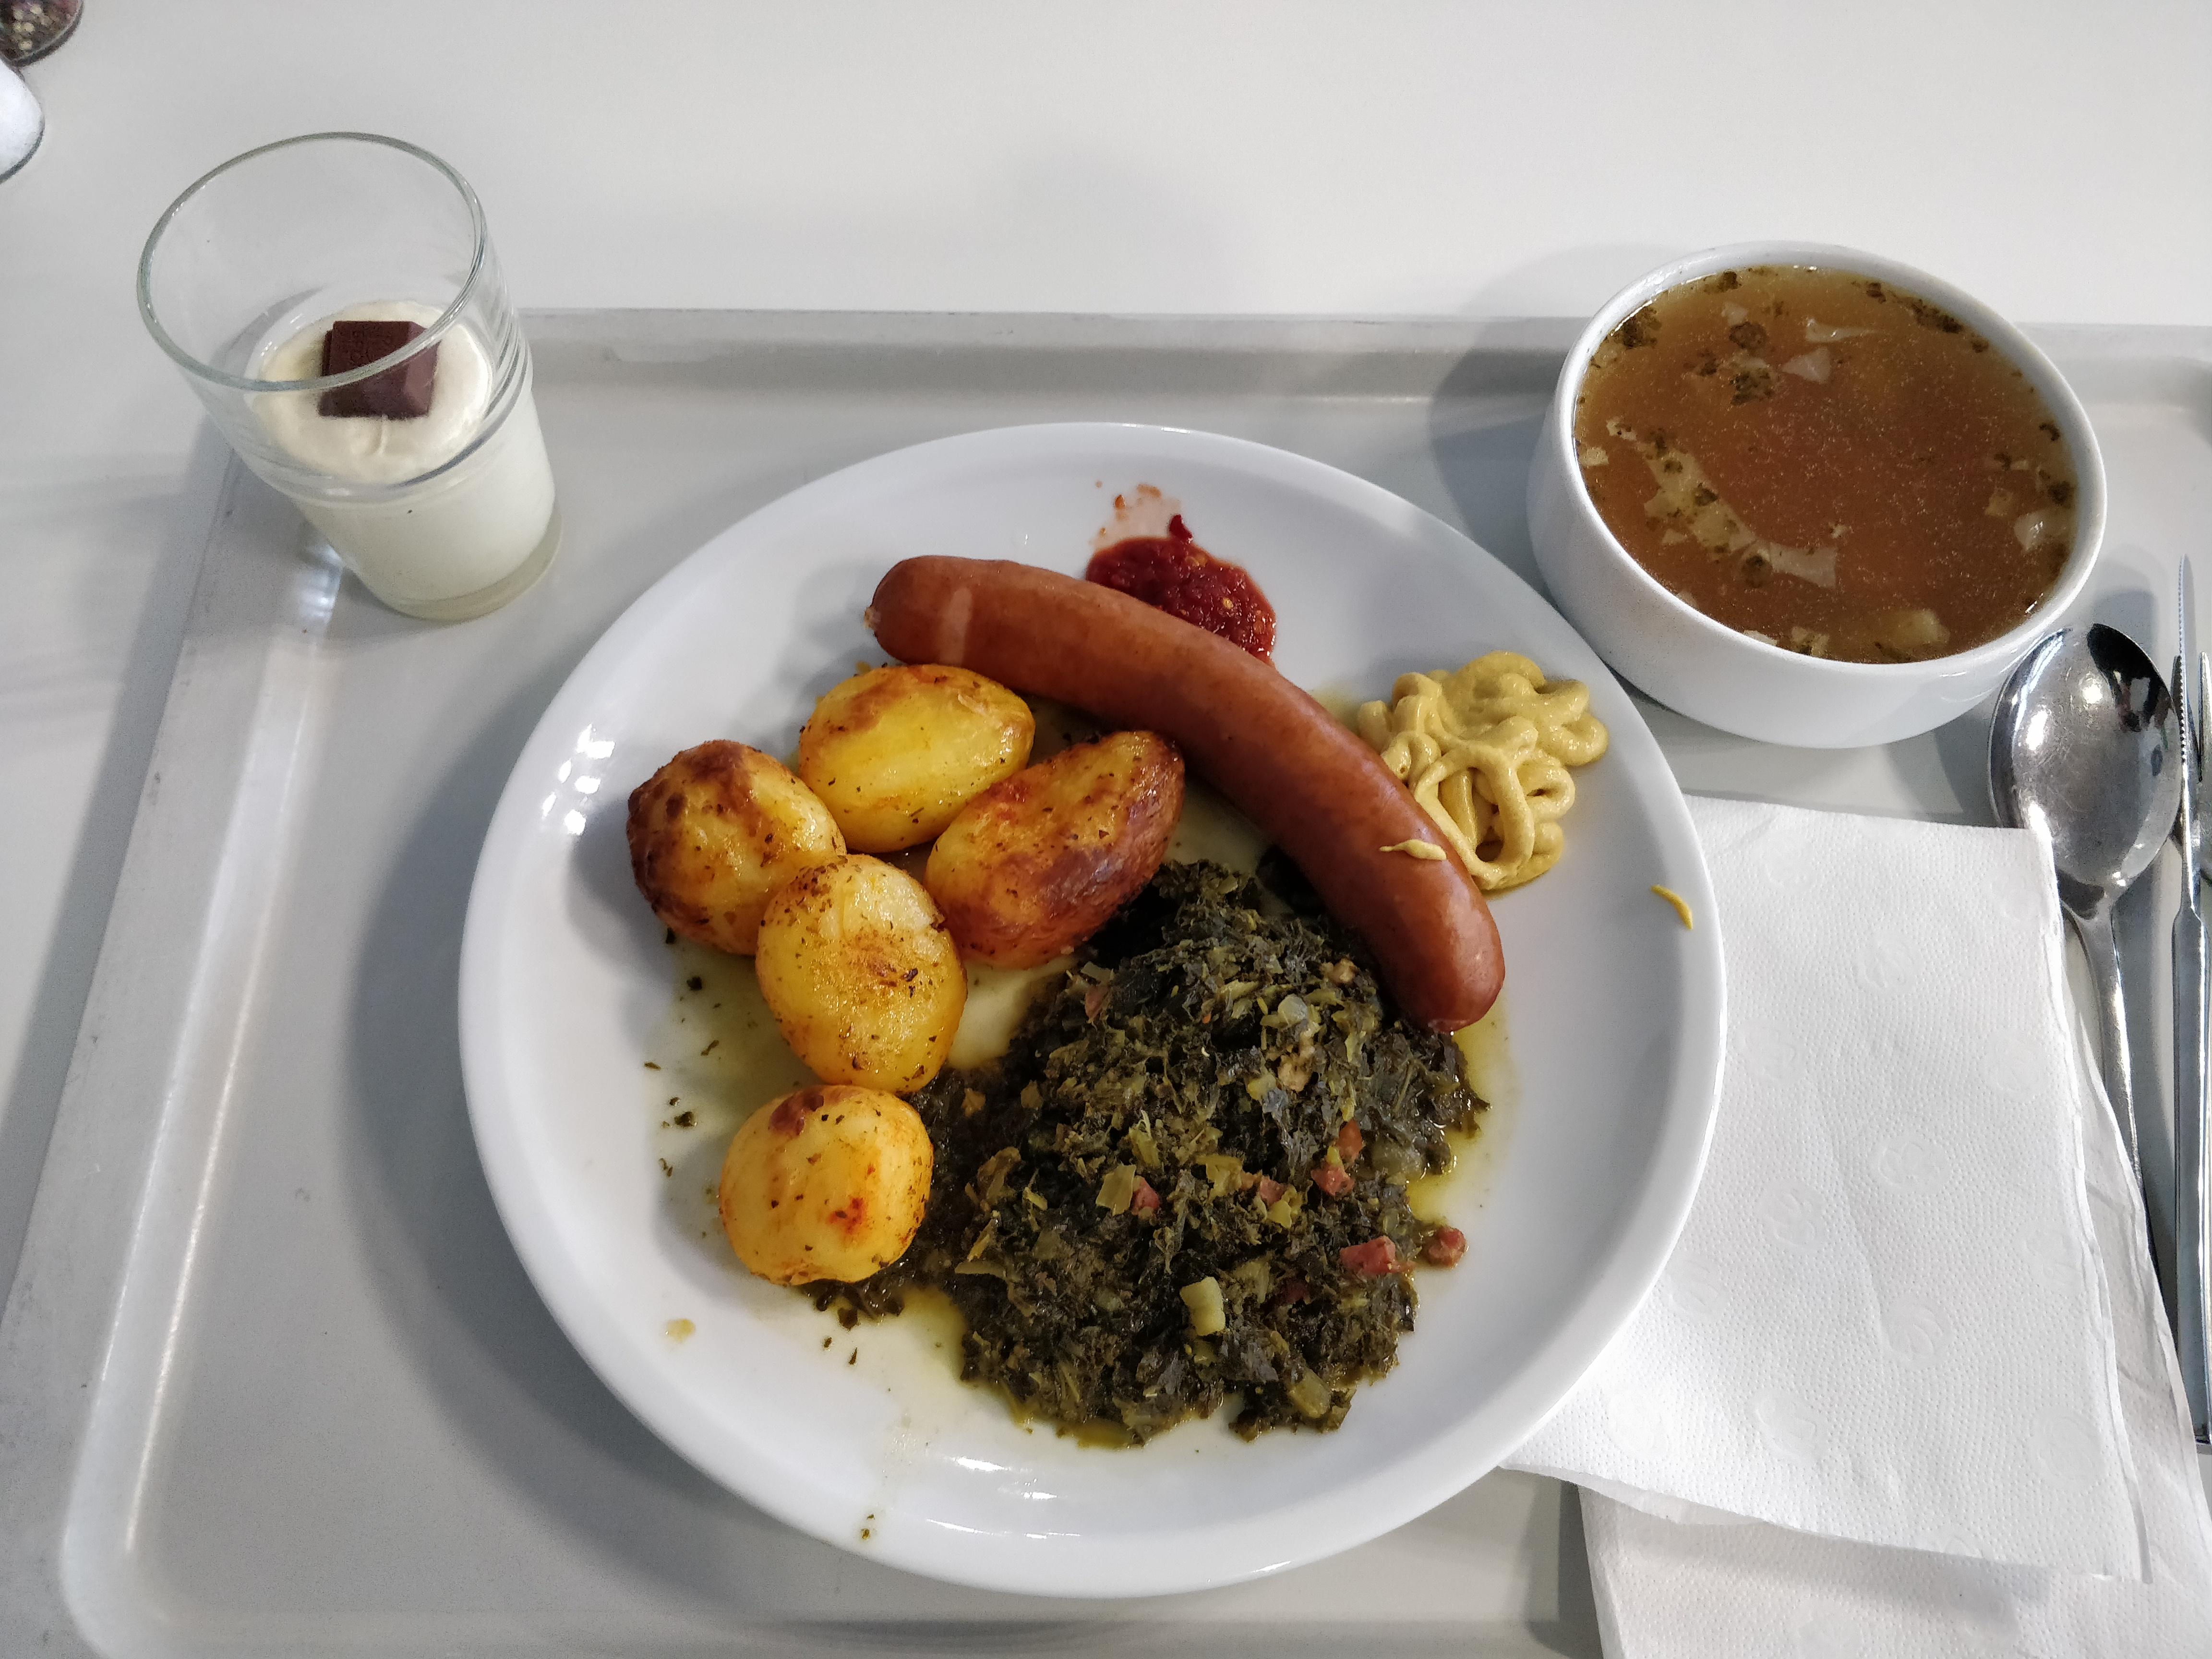 https://foodloader.net/nico_2018-12-03_gruenkohl-pinkel-kartoffeln-suppe-nachtisch.jpg